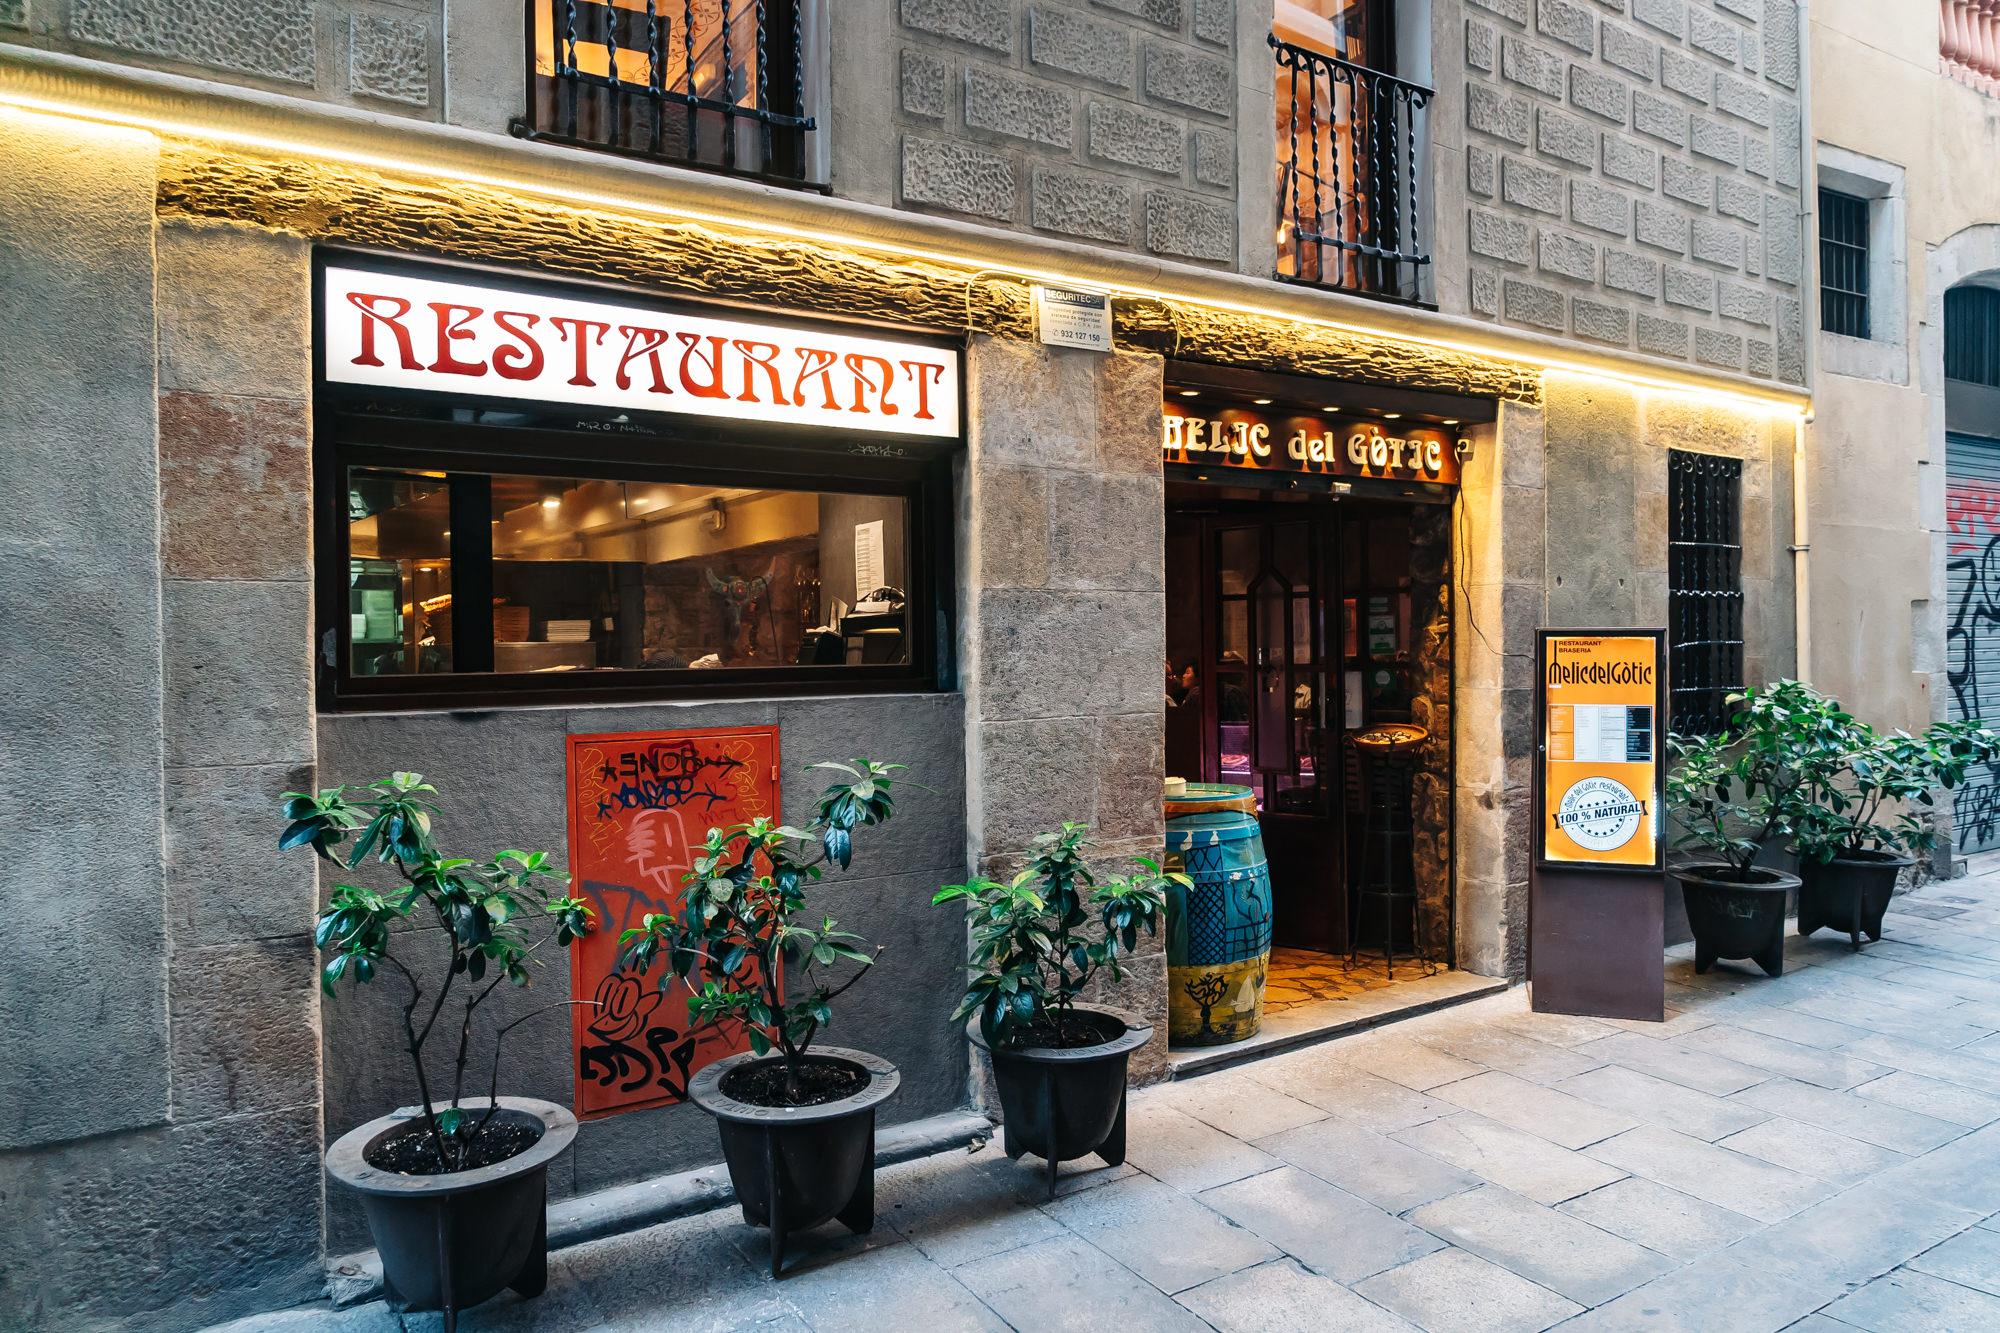 Melic Del Gotic restaurant